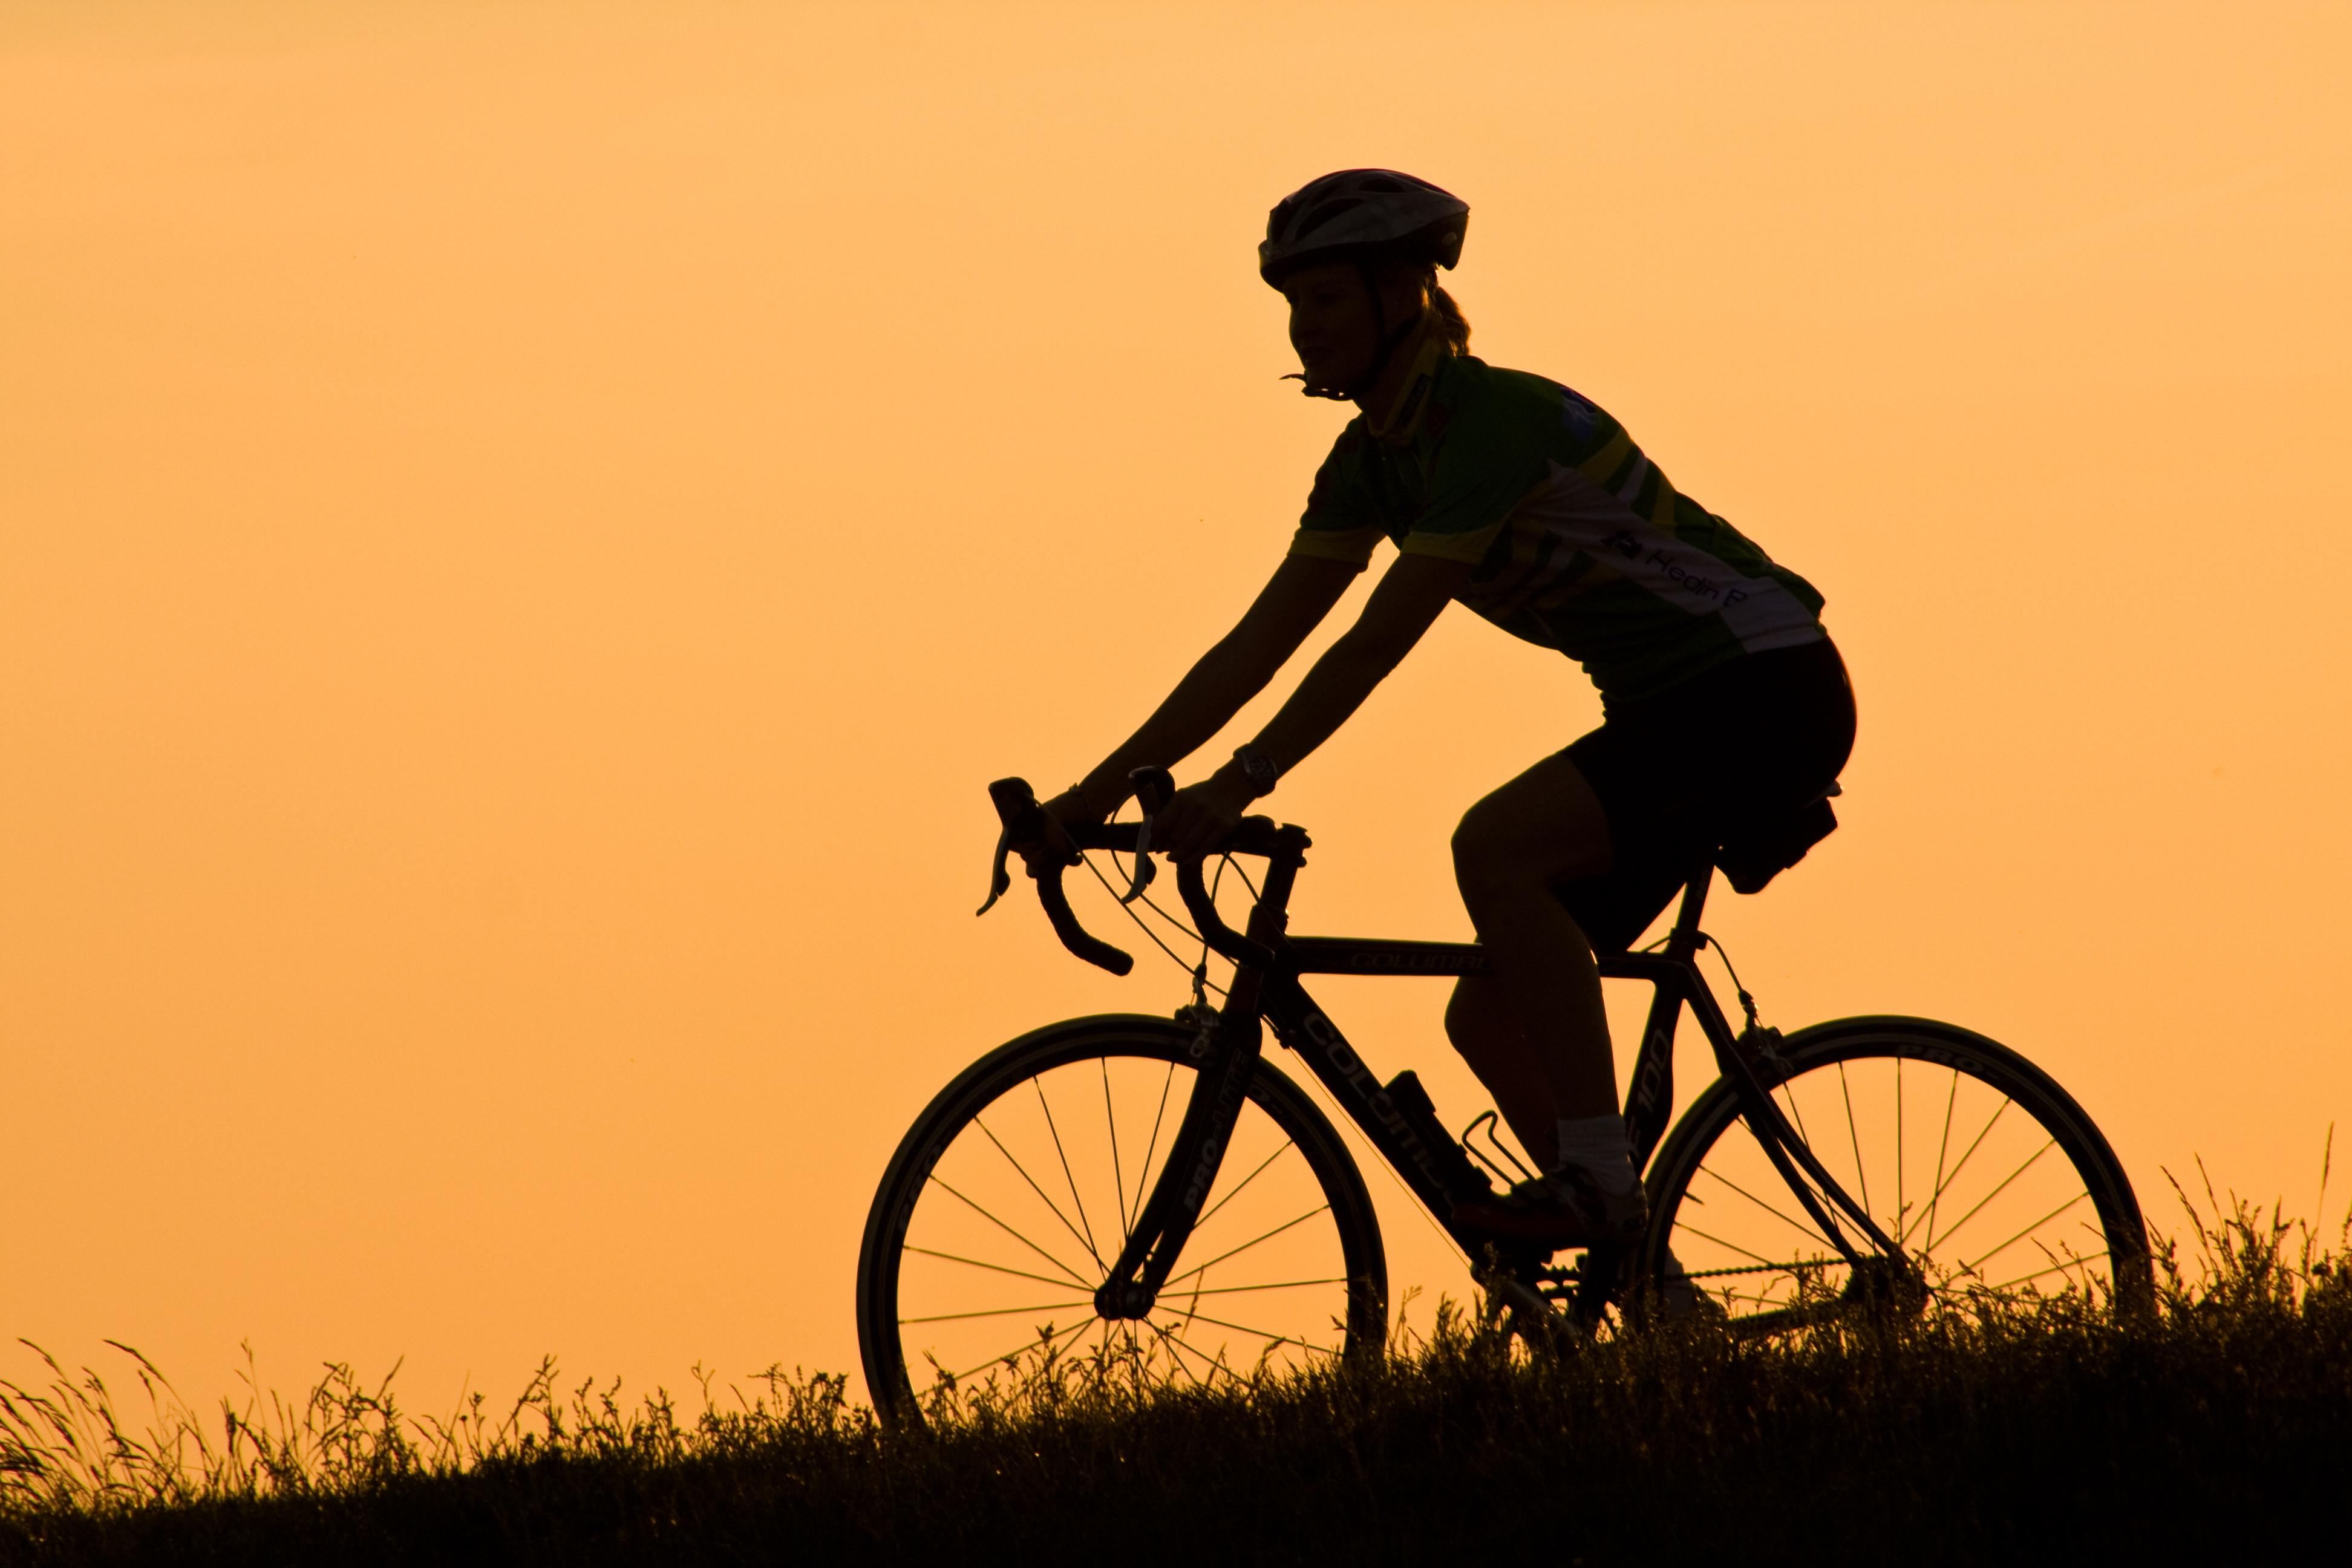 Sunset cycling | photo page - everystockphoto